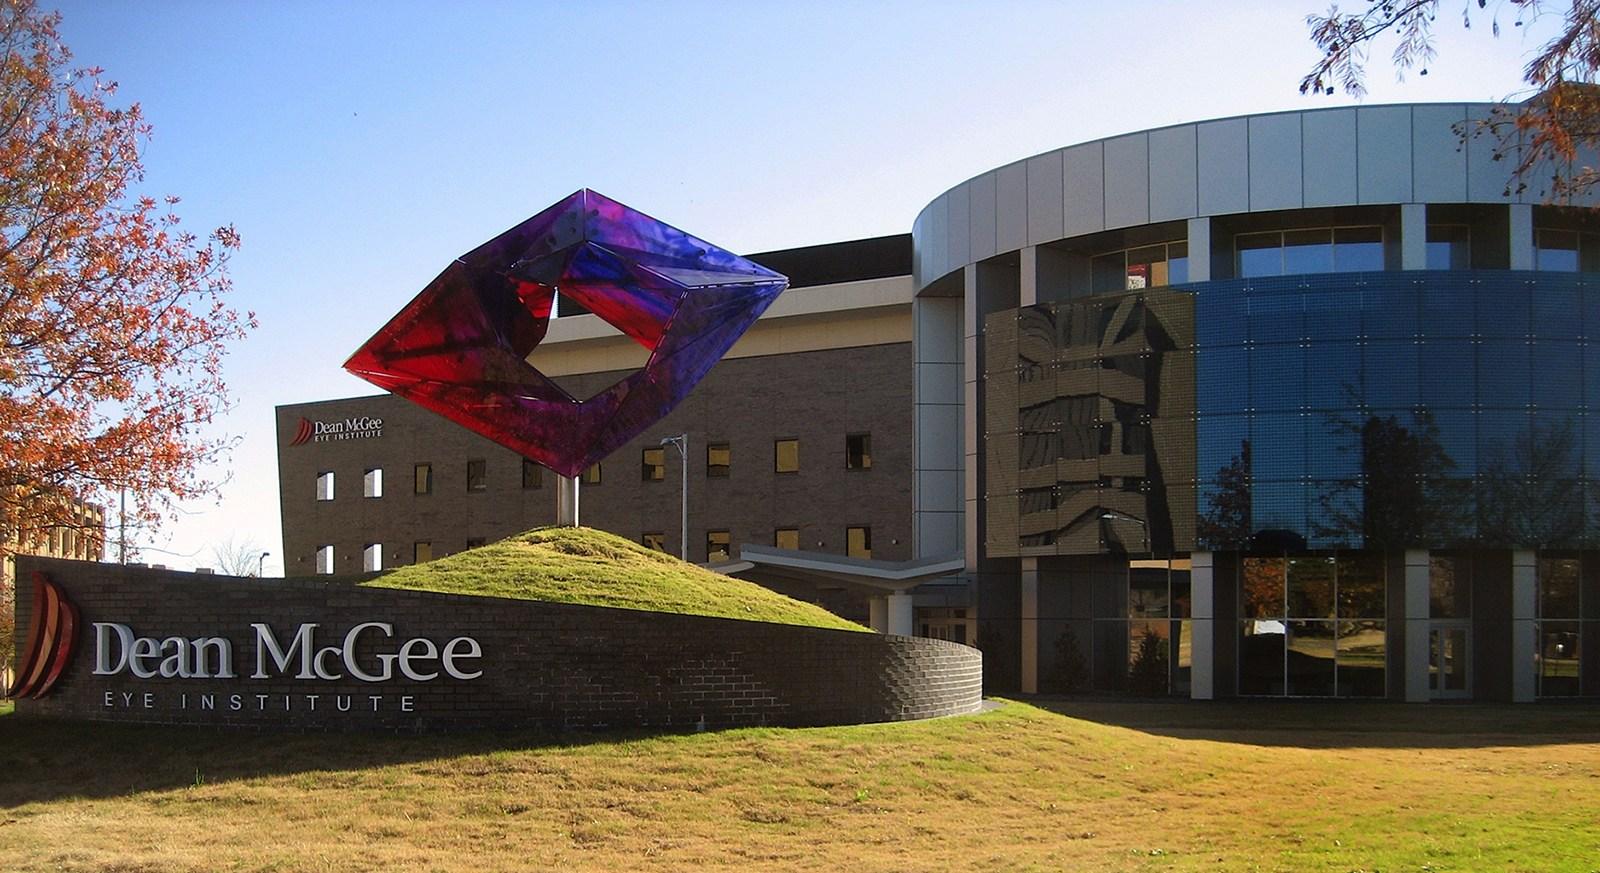 Dean-McGee-Institute.jpg